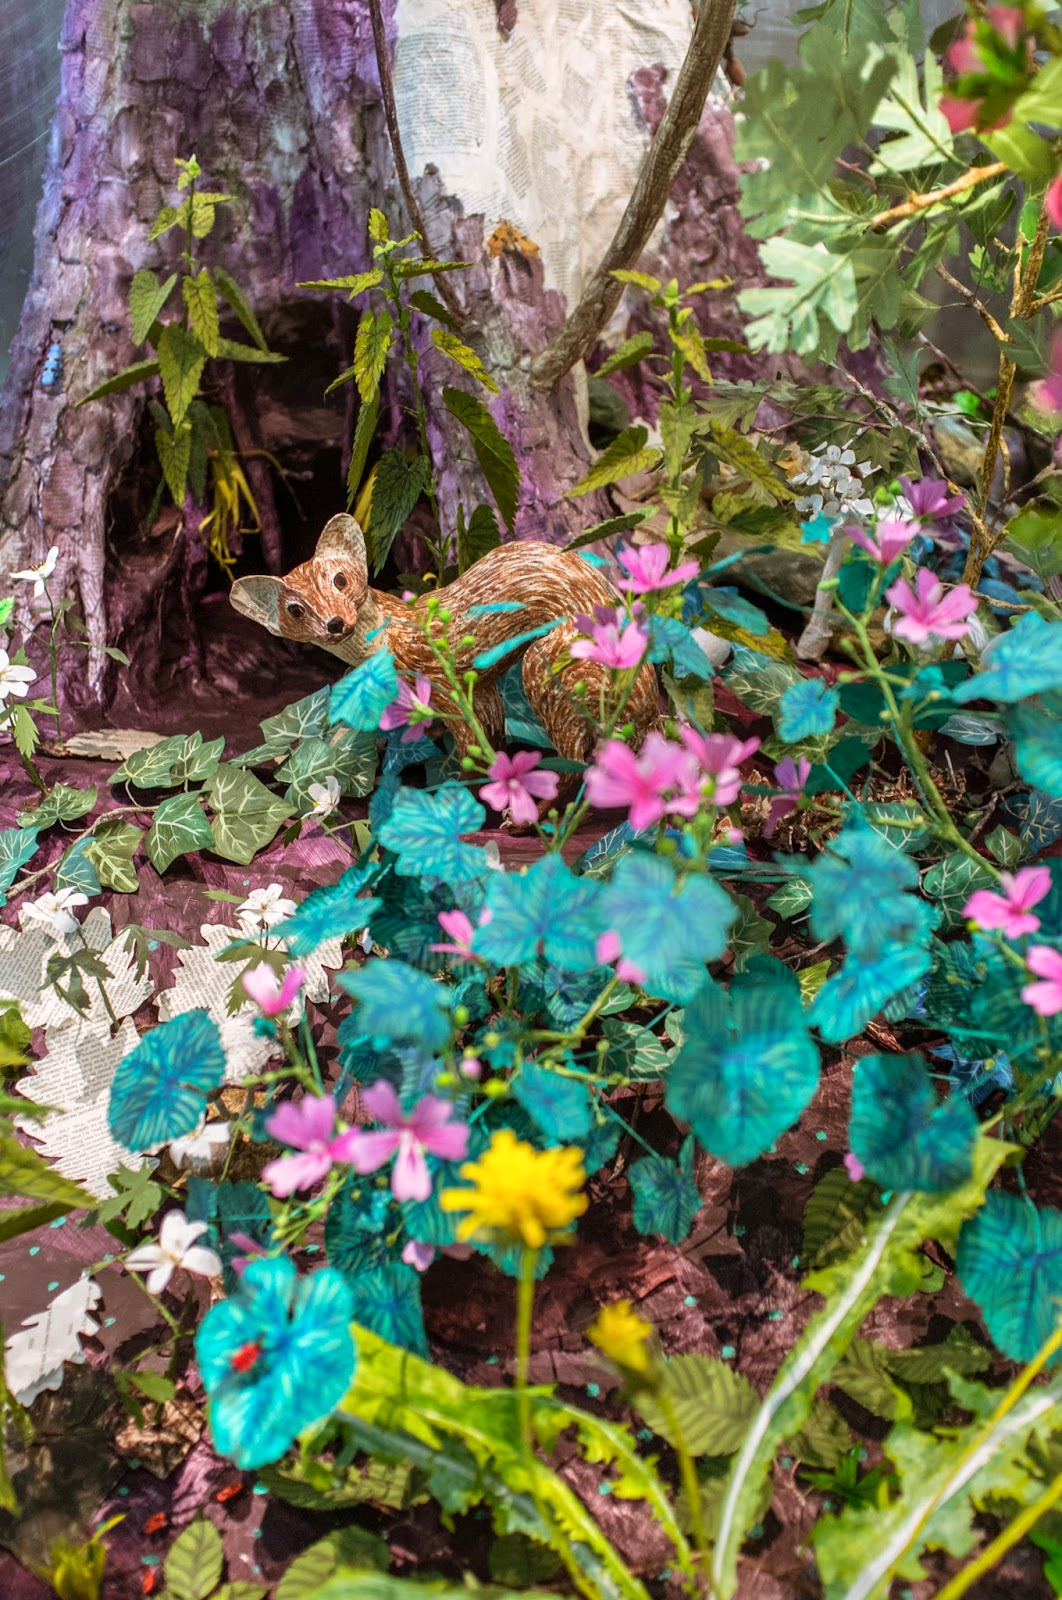 Exposition: Fleurs en campagne, Bagatelle, Anne-Lise Koehler